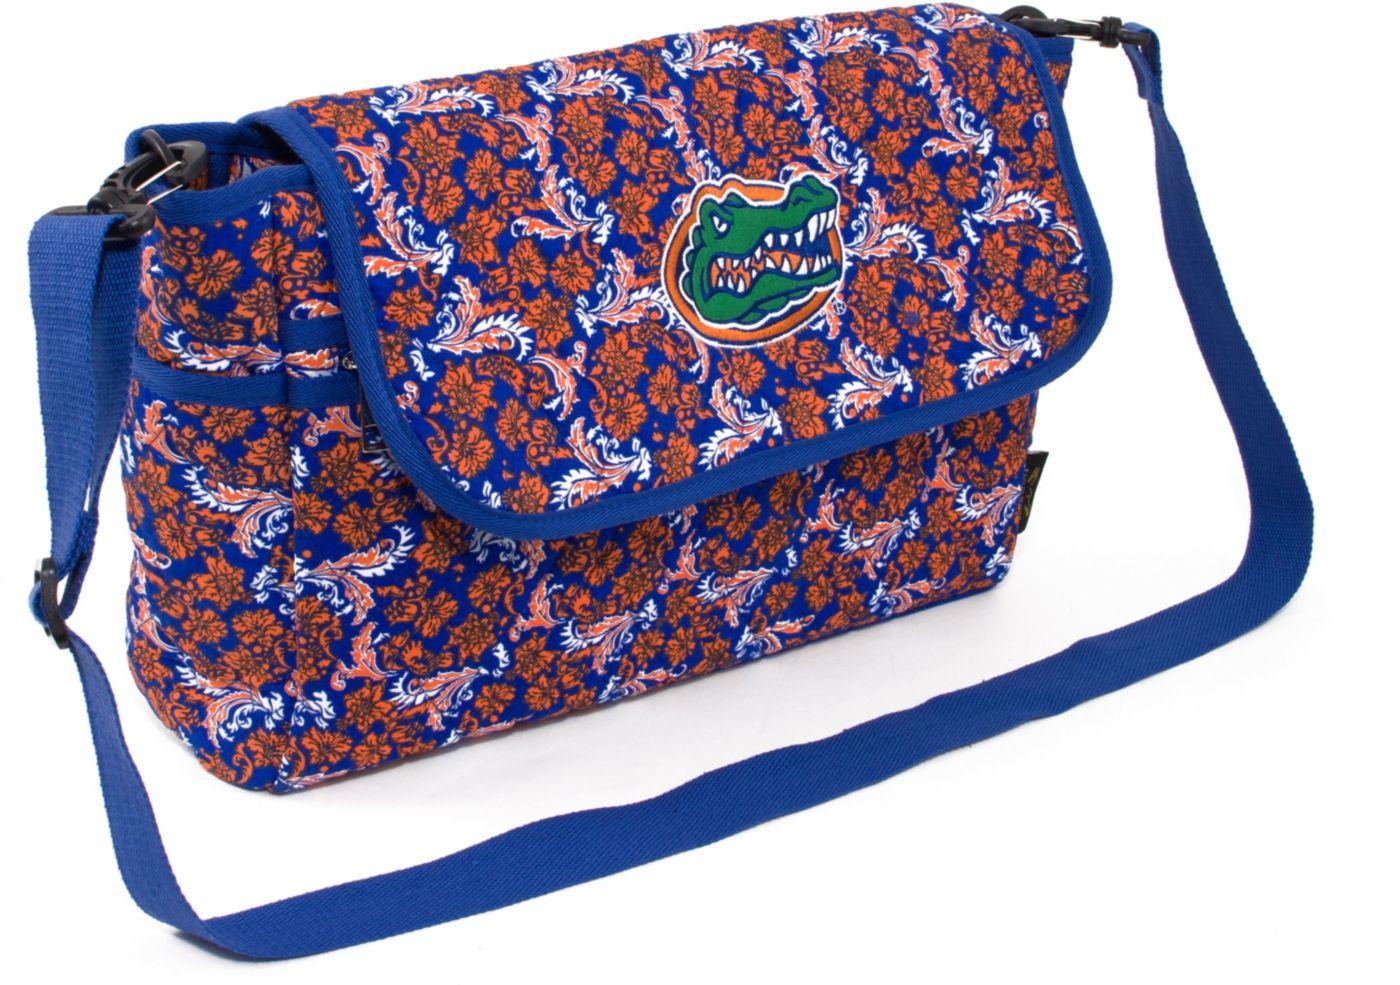 Eagles Wings Florida Gators Quilted Cotton Messenger Bag